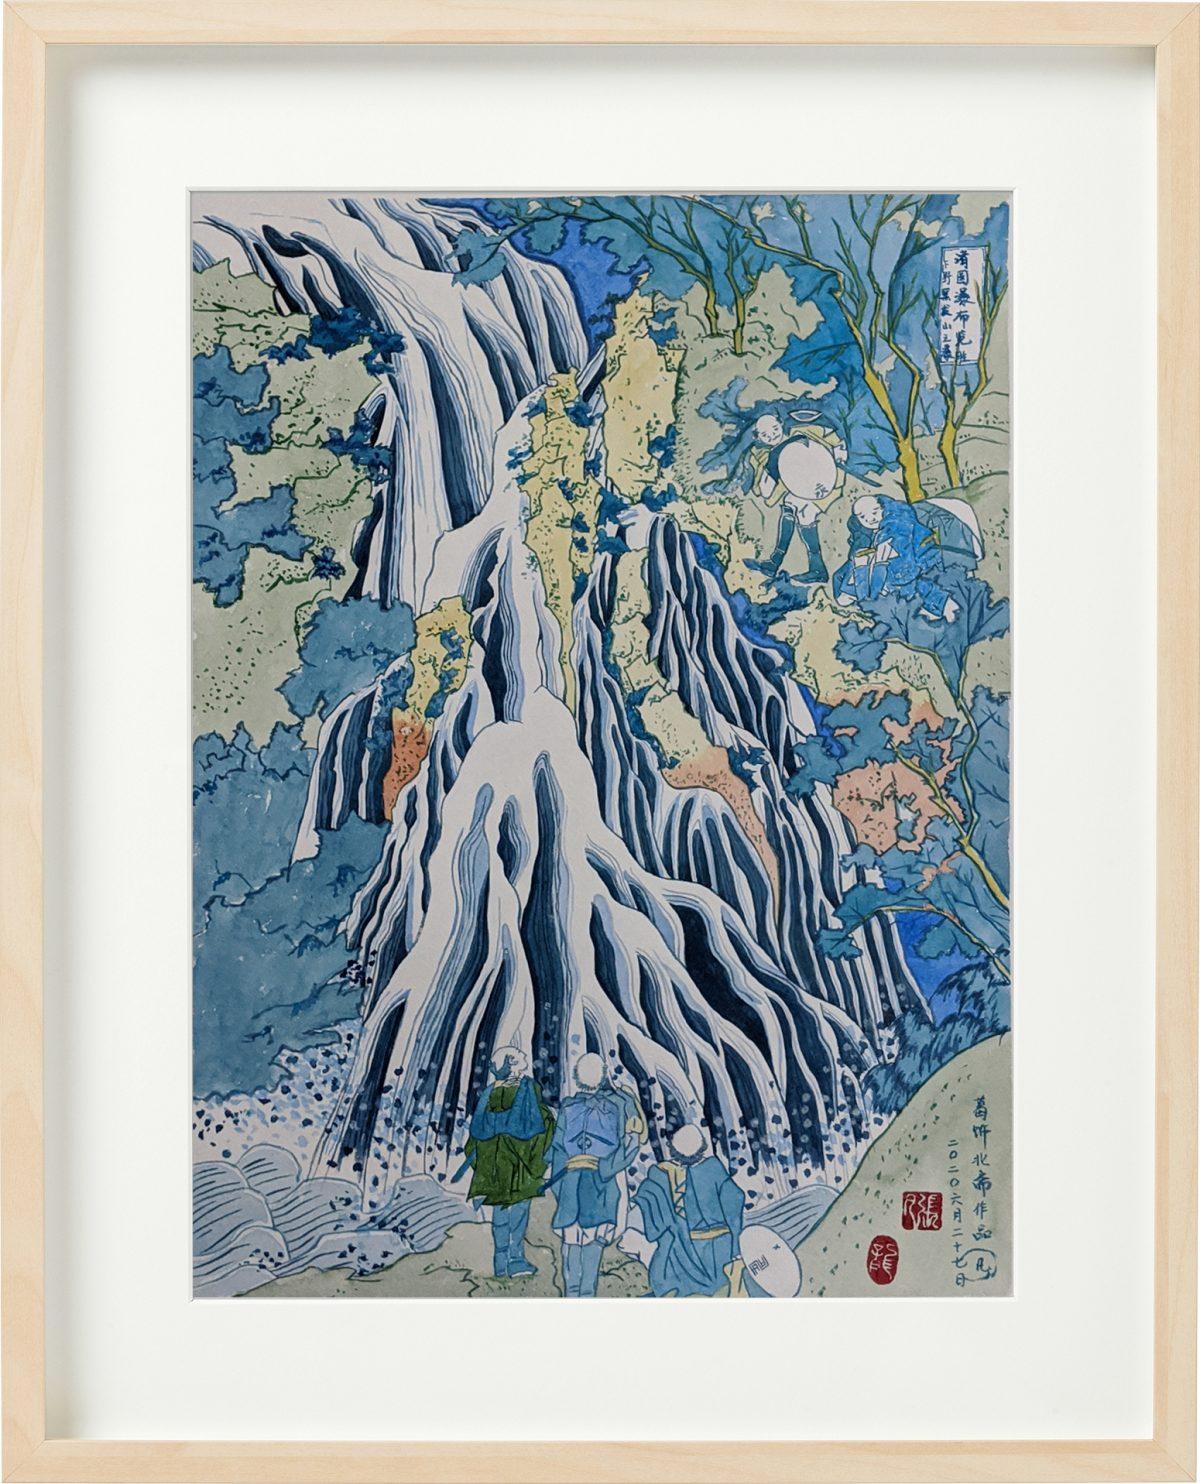 Kirifuri Waterfall at Mount Kurokami in Shimotsuke Province By Fan Stanbrough